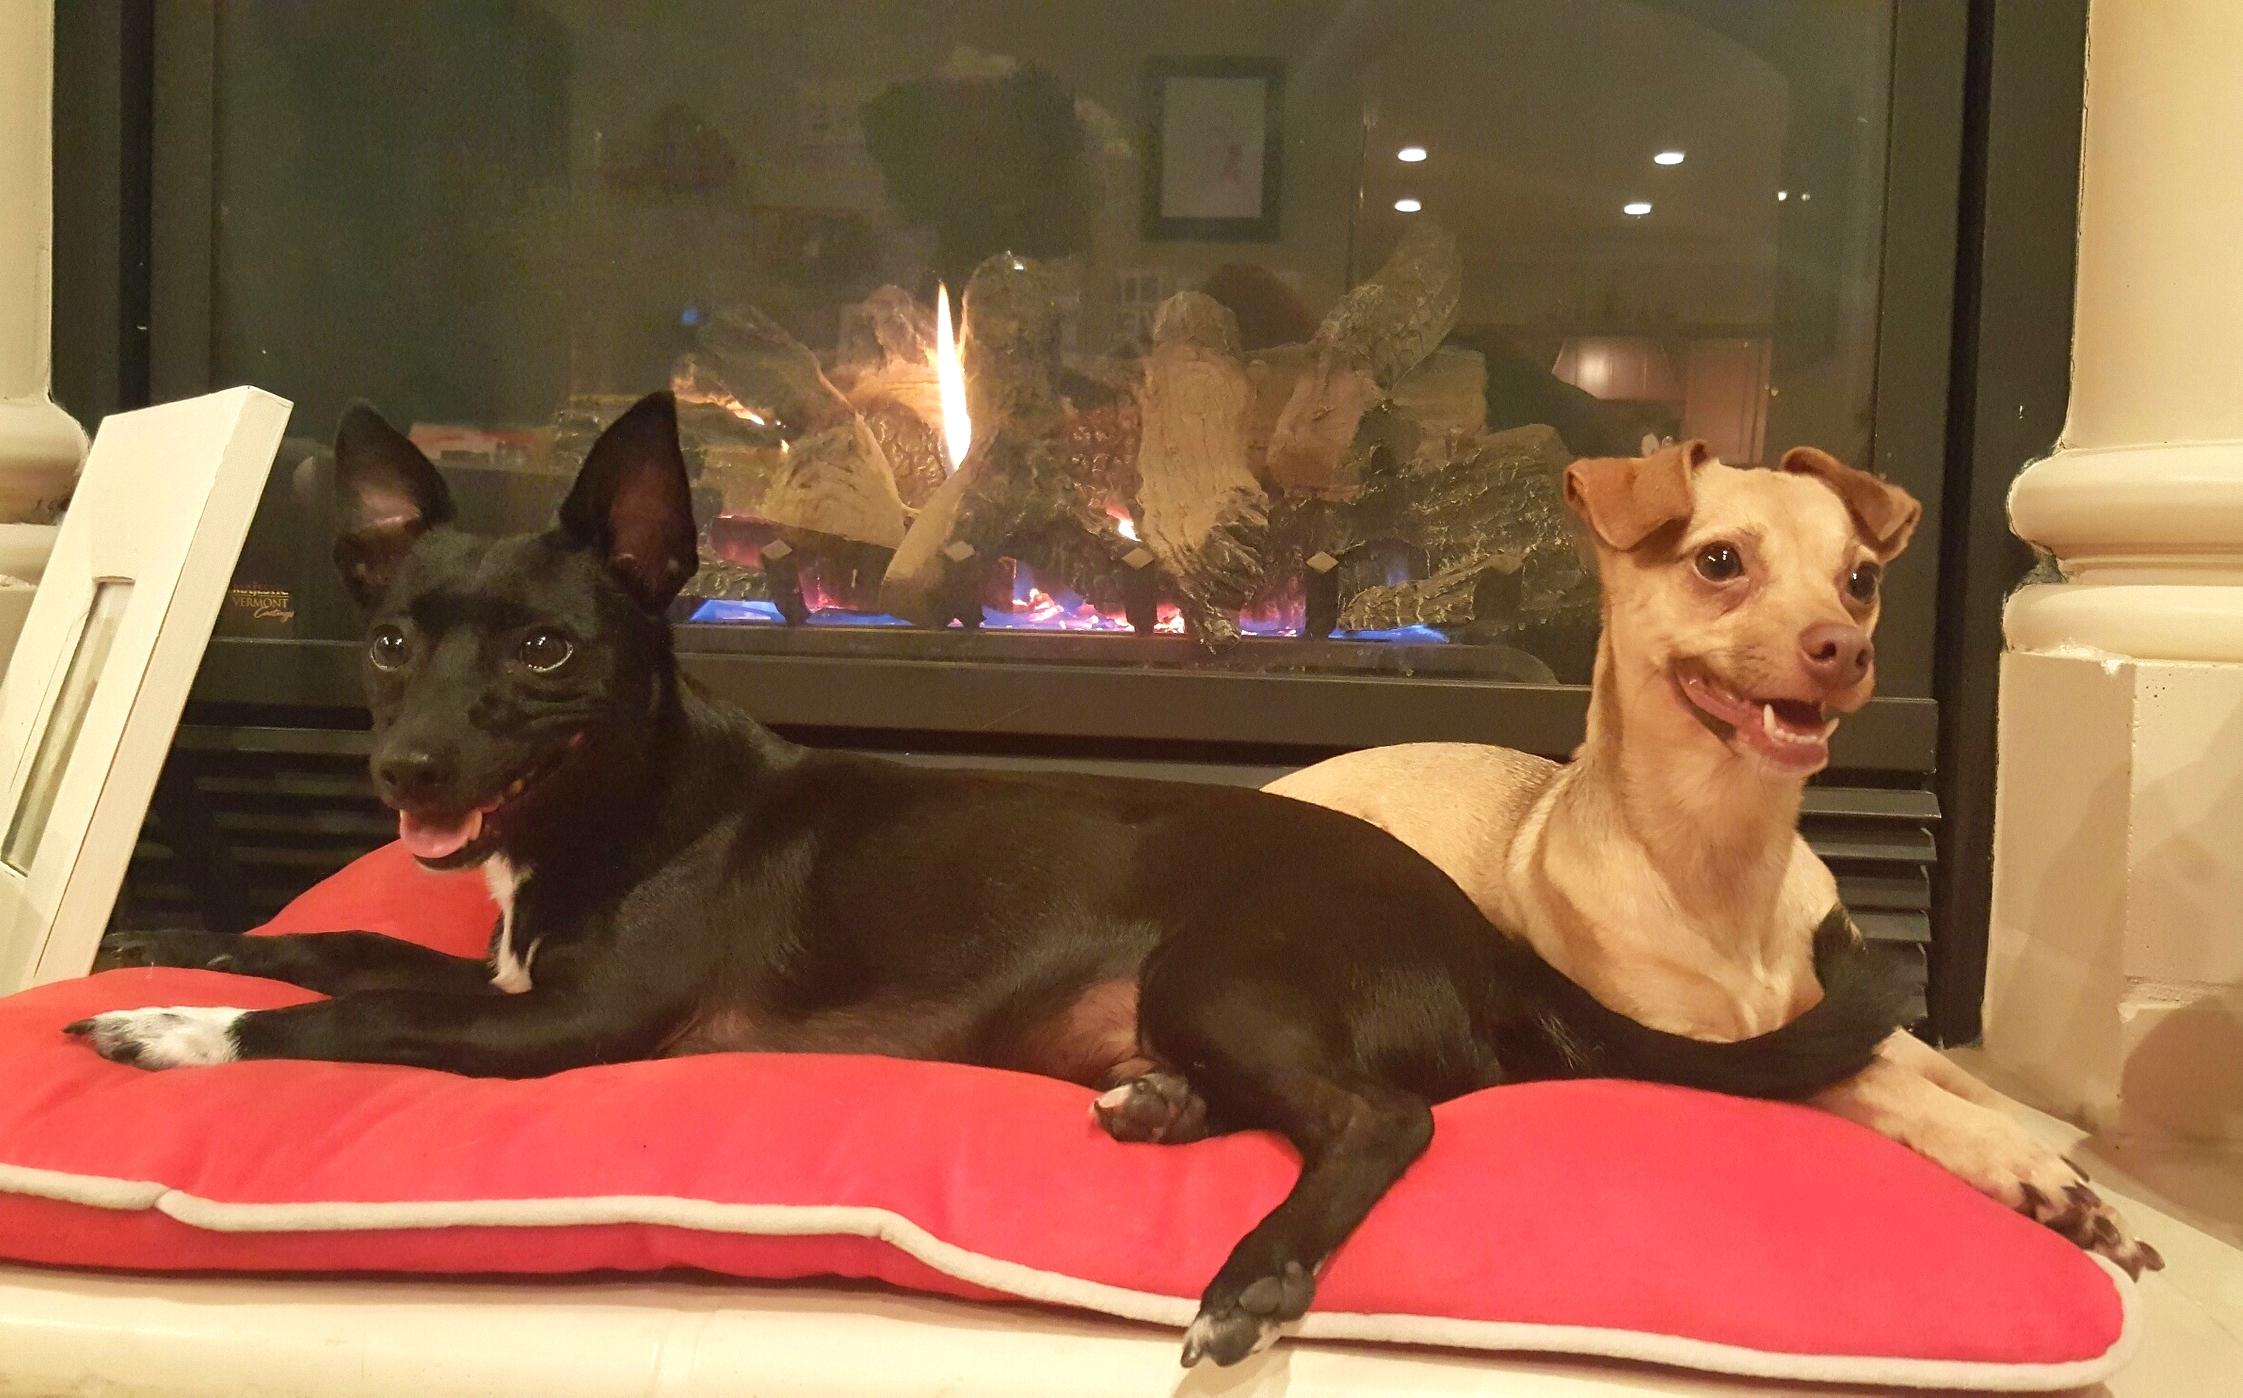 Bixby and Khaleesi